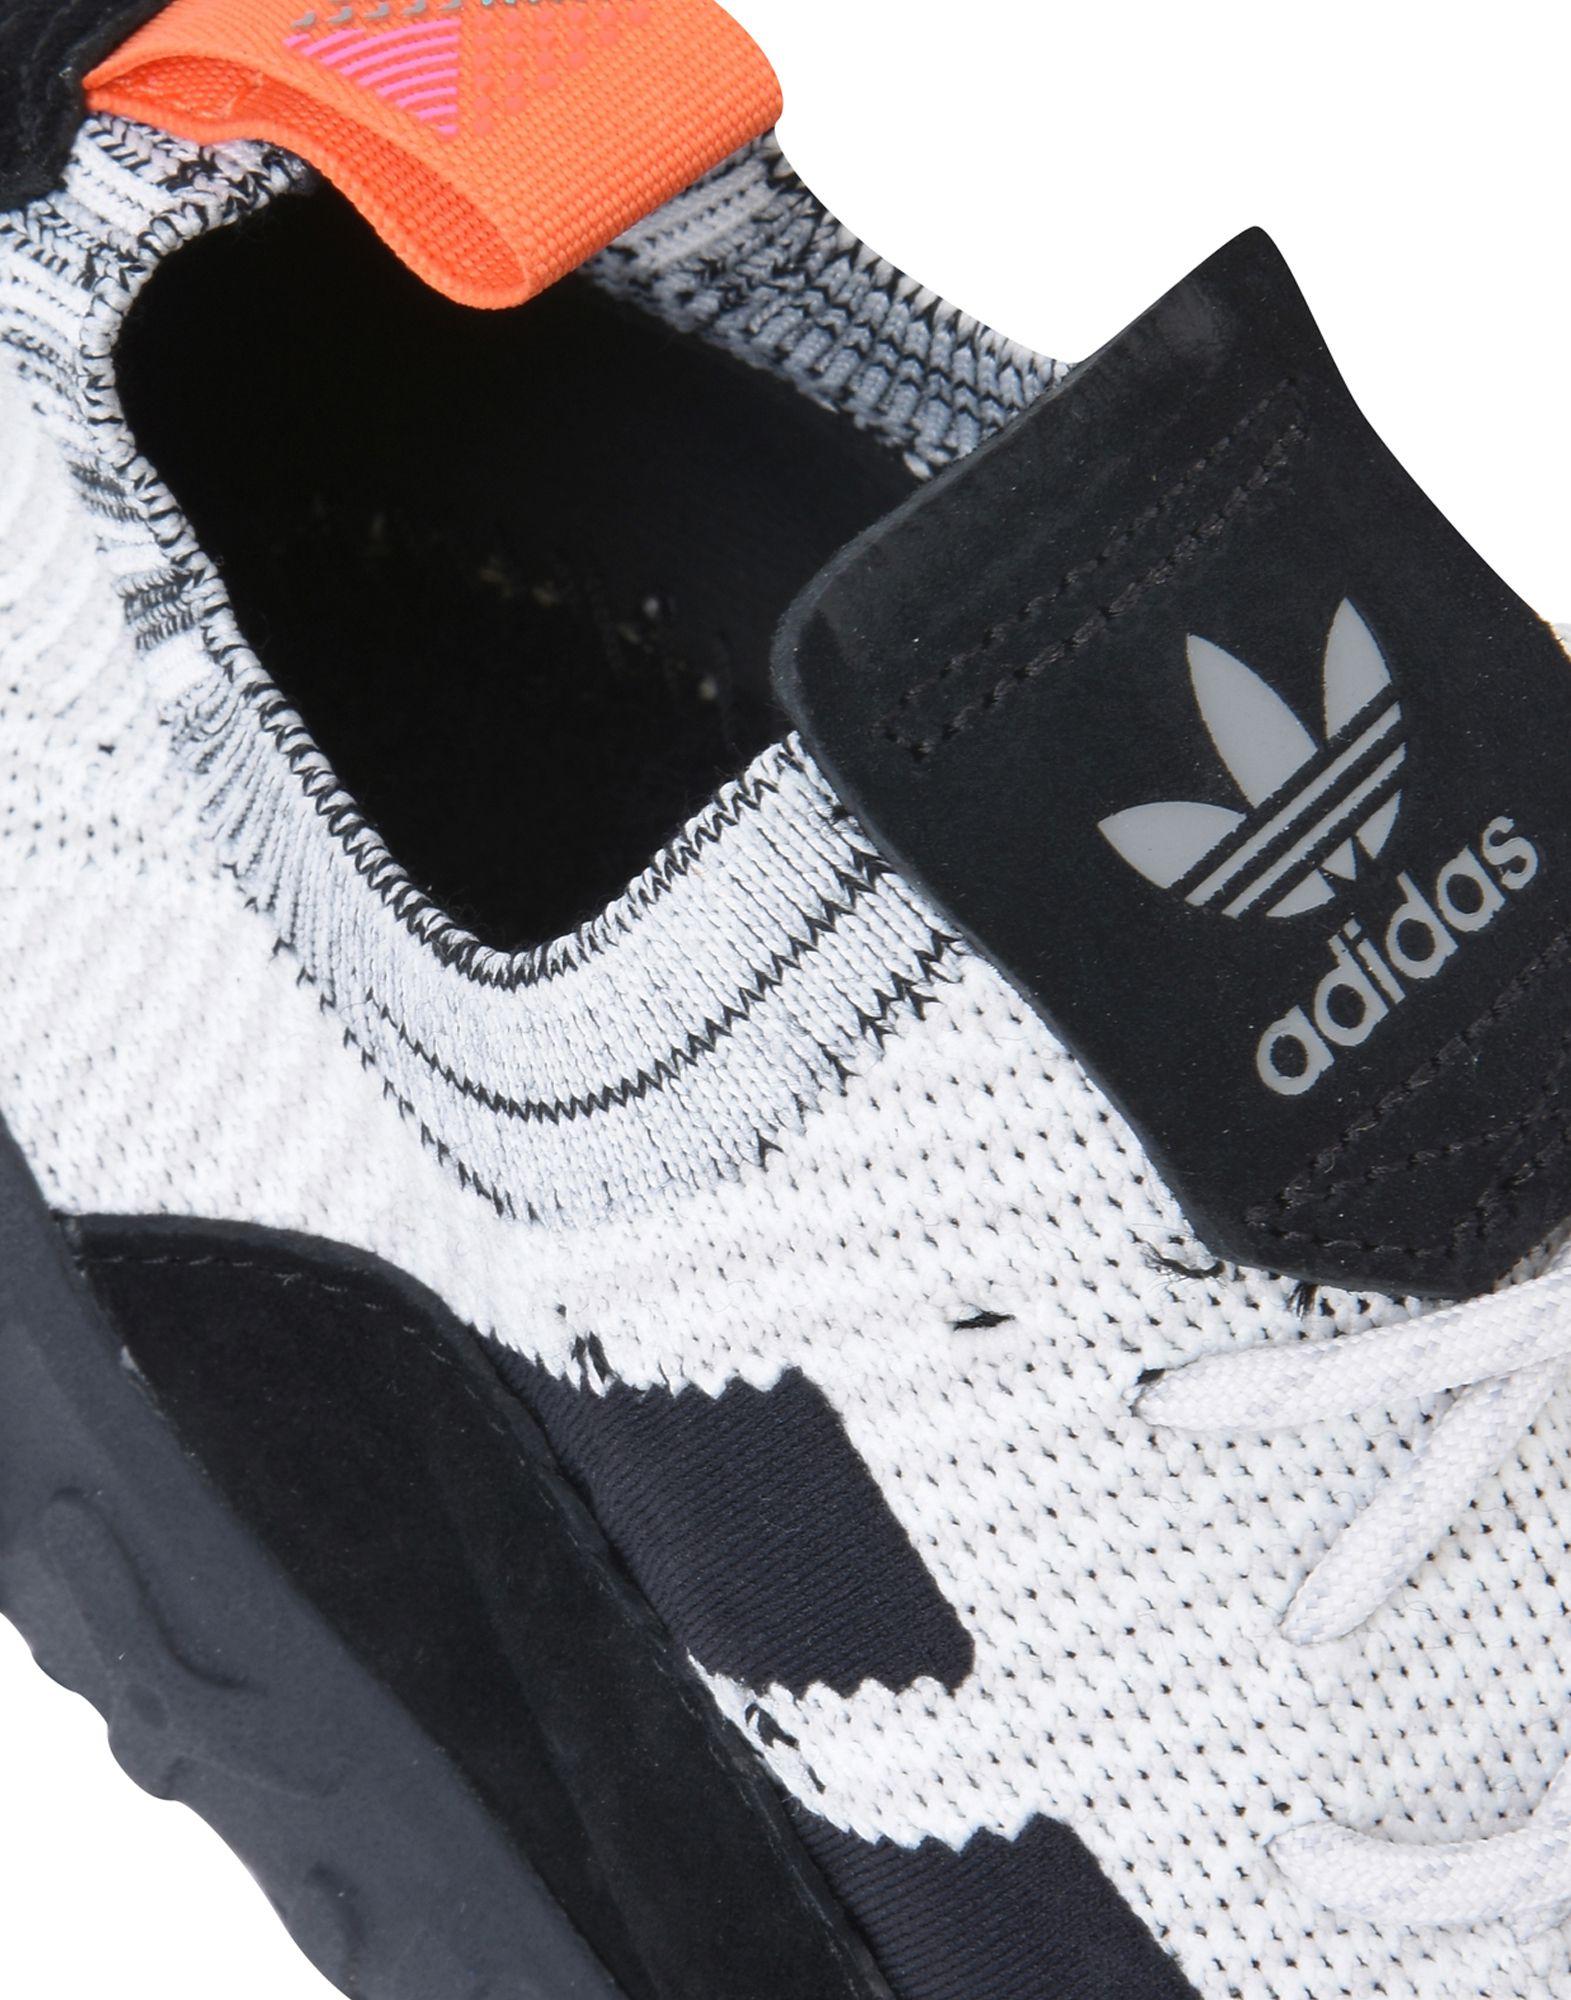 Adidas Originals F/22 Pk  11537264CG Gute Gute Gute Qualität beliebte Schuhe fdf572